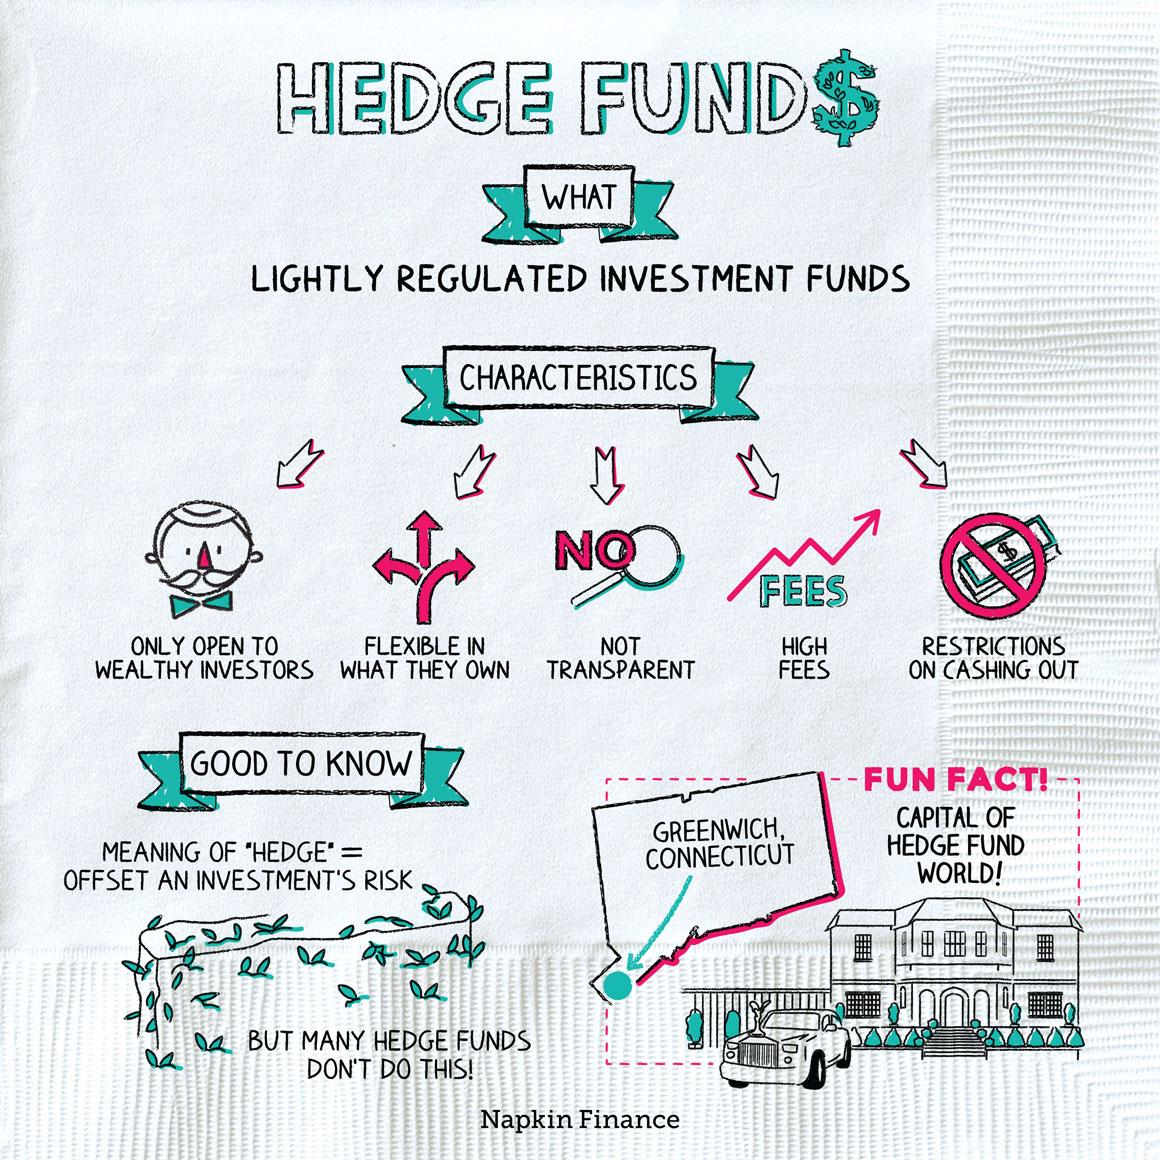 Hedge Fund benefits